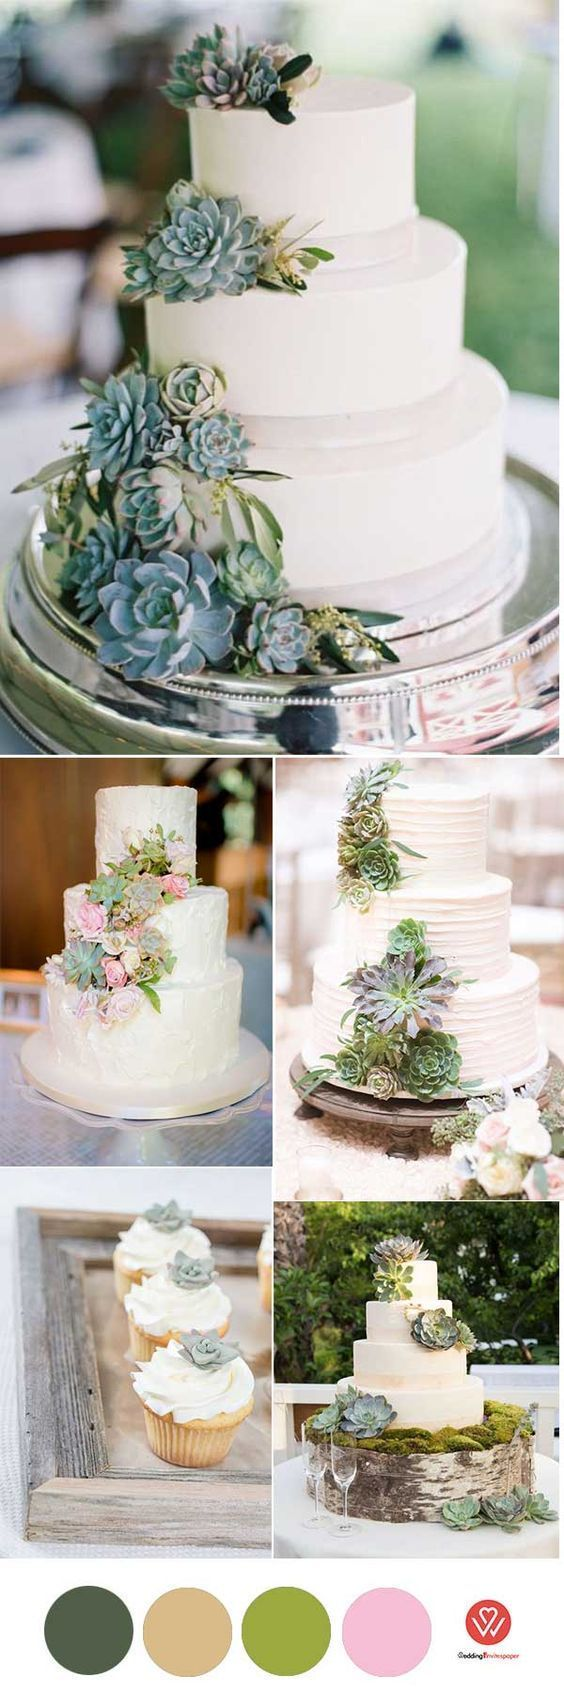 Elegant rustic wedding cake dorty pinterest wedding wedding